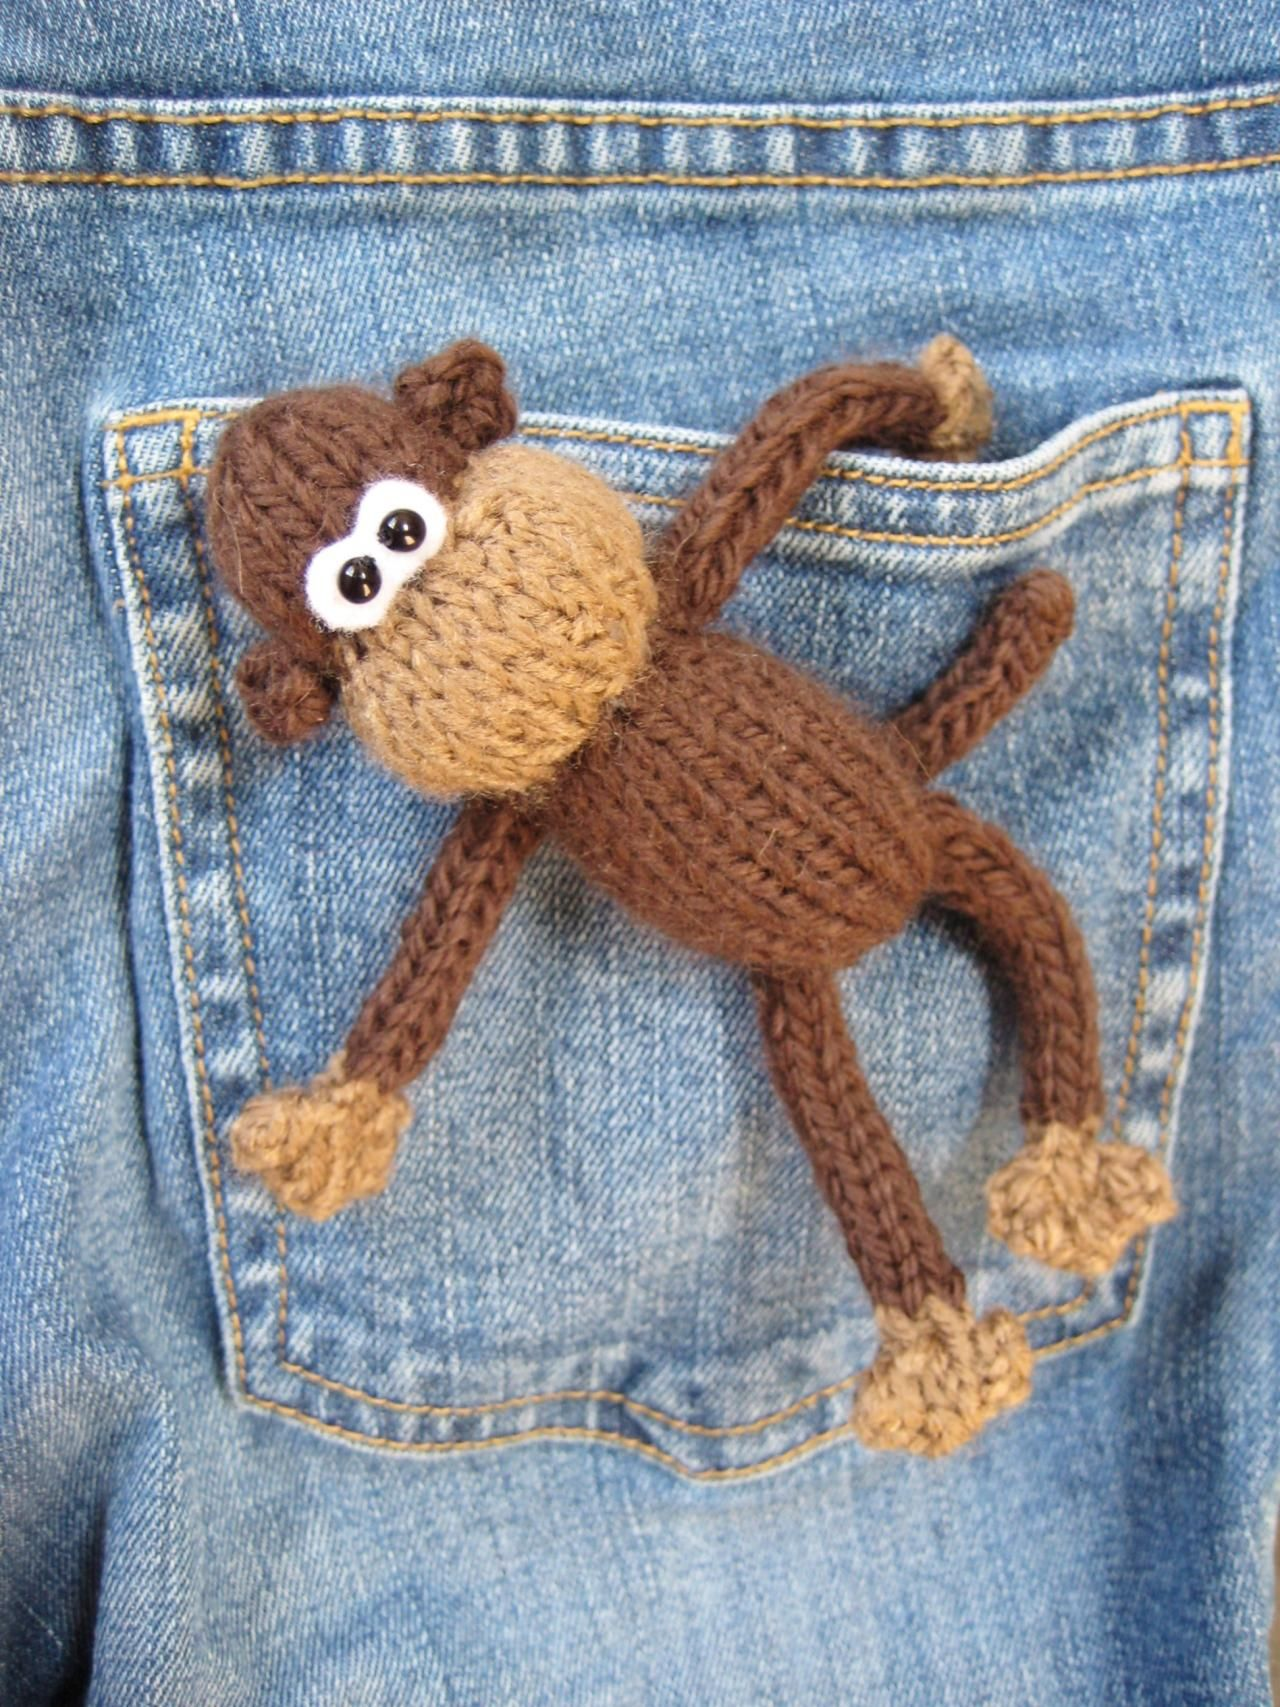 Pocket monkey mini toy knitting pattern pdf knit pinterest pocket monkey mini toy knitting pattern pdf bankloansurffo Choice Image